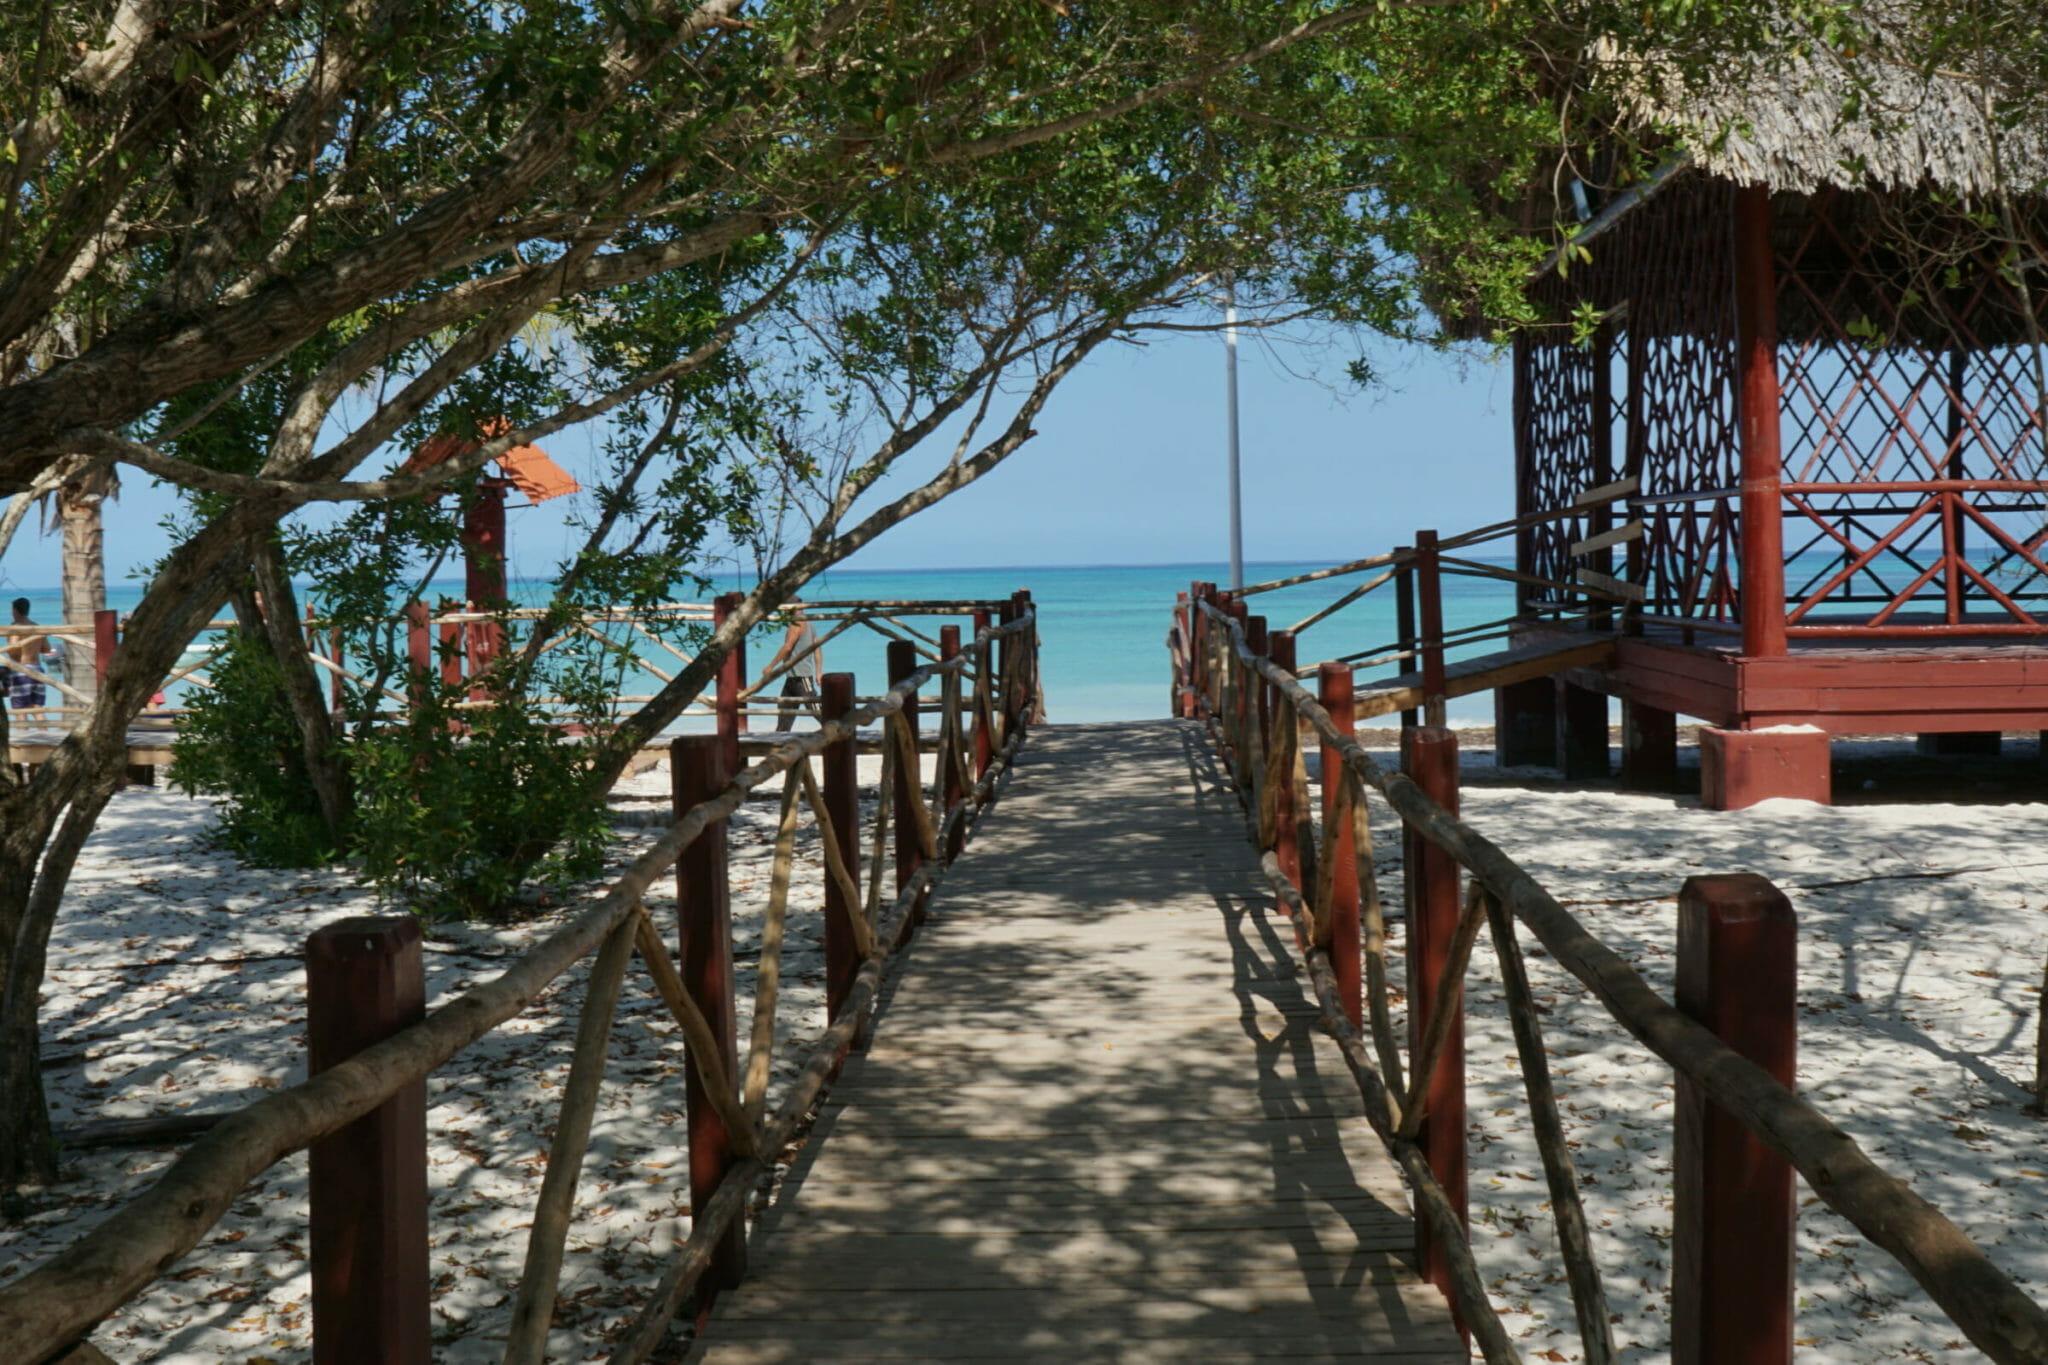 Walkway to ocean view